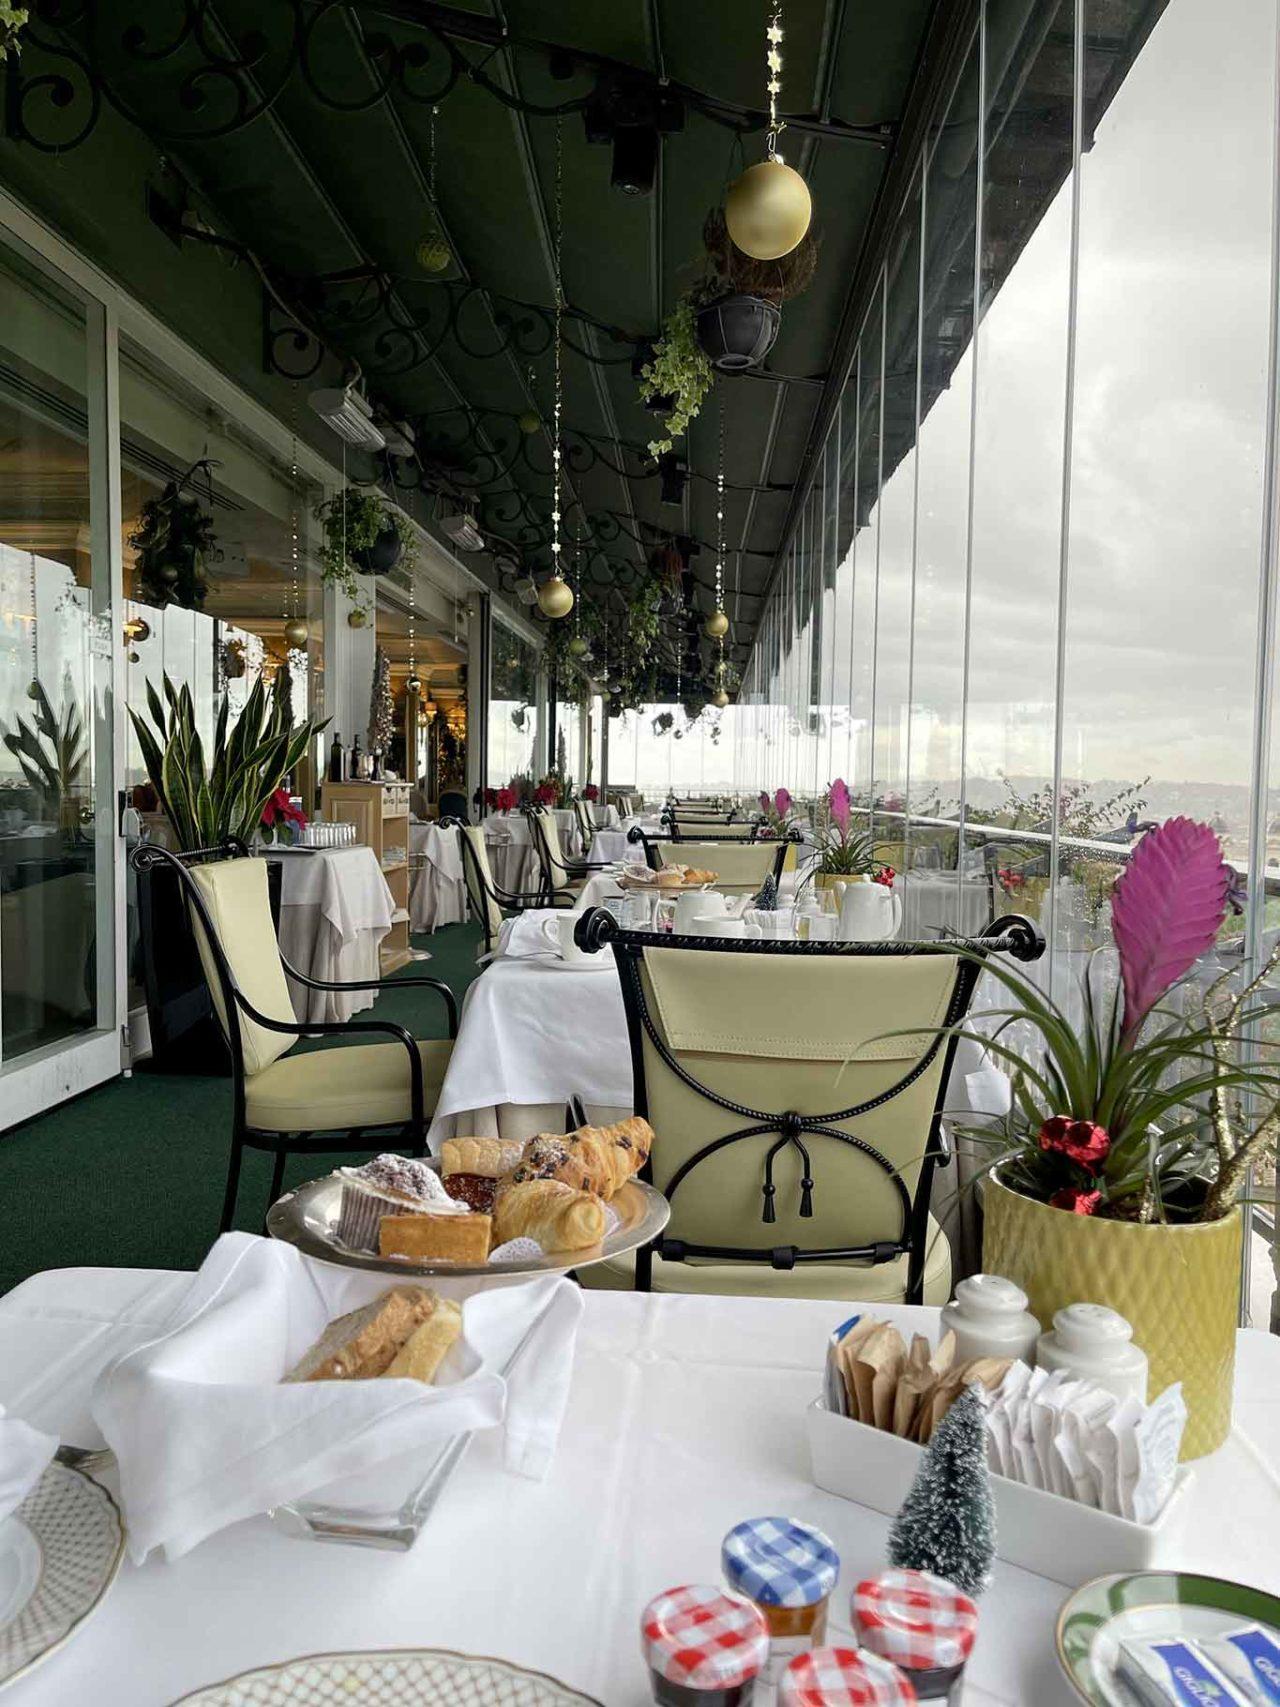 Mirabelle ristorante Roma staycation